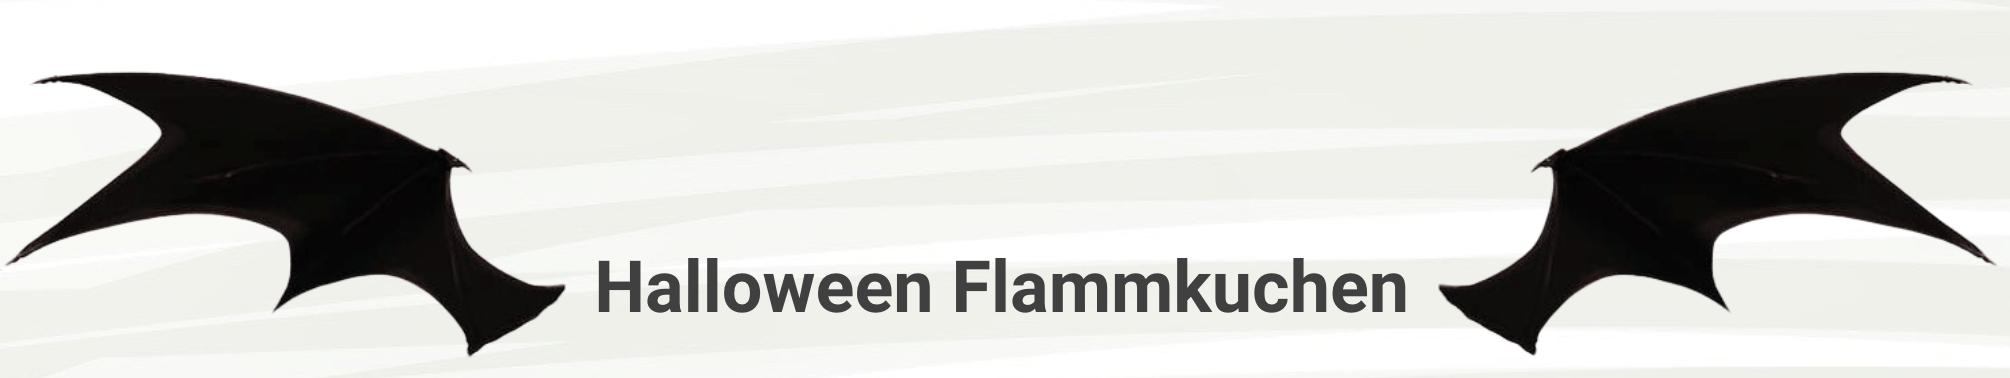 Halloween Flammkuchen